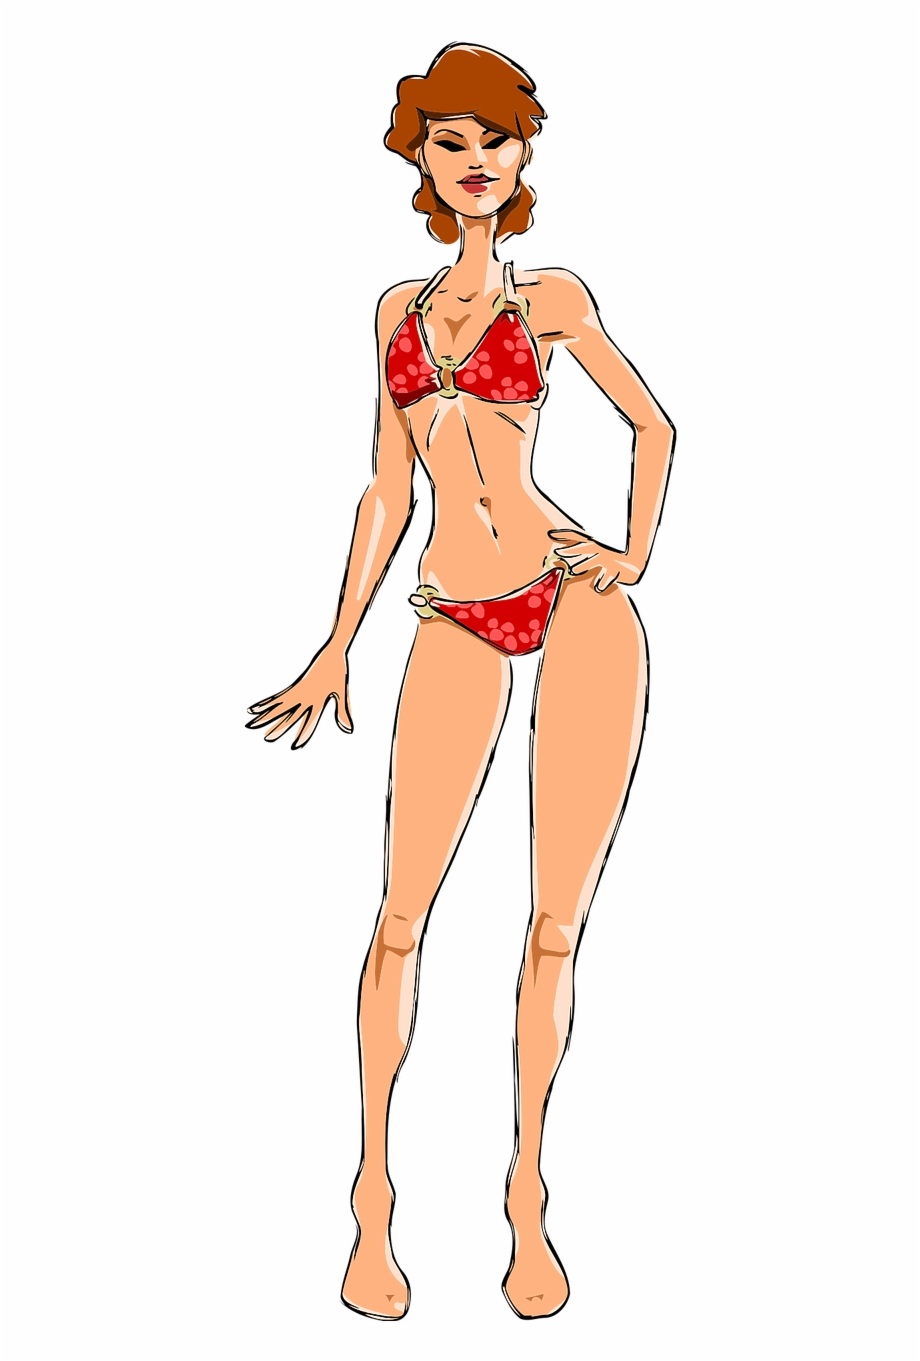 Bikini Female Girl Lady Model Png Image Woman.